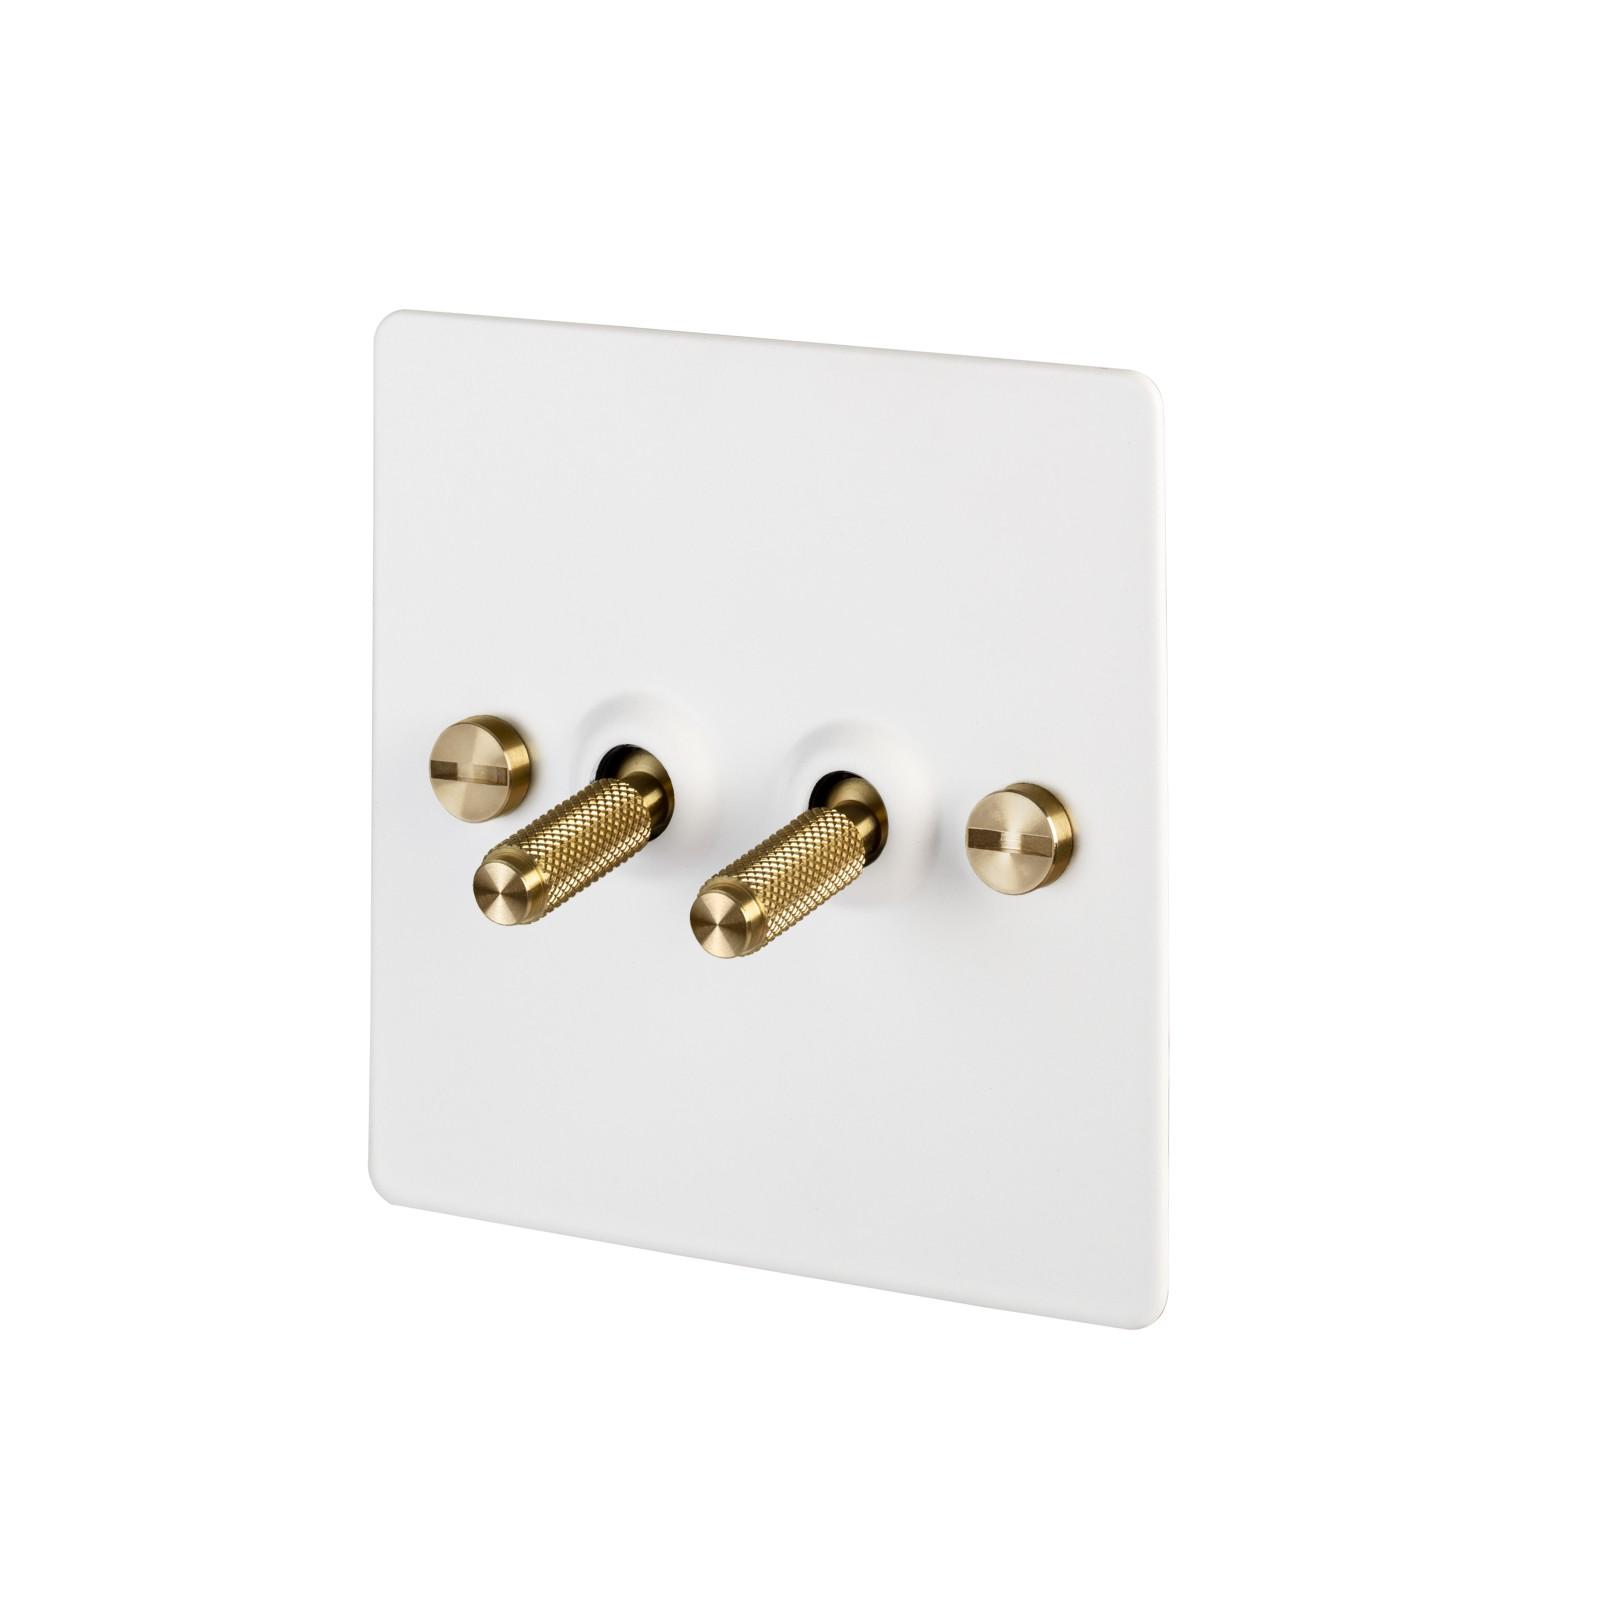 2G Toggle Switch 2G Toggle Switch / White / Brass